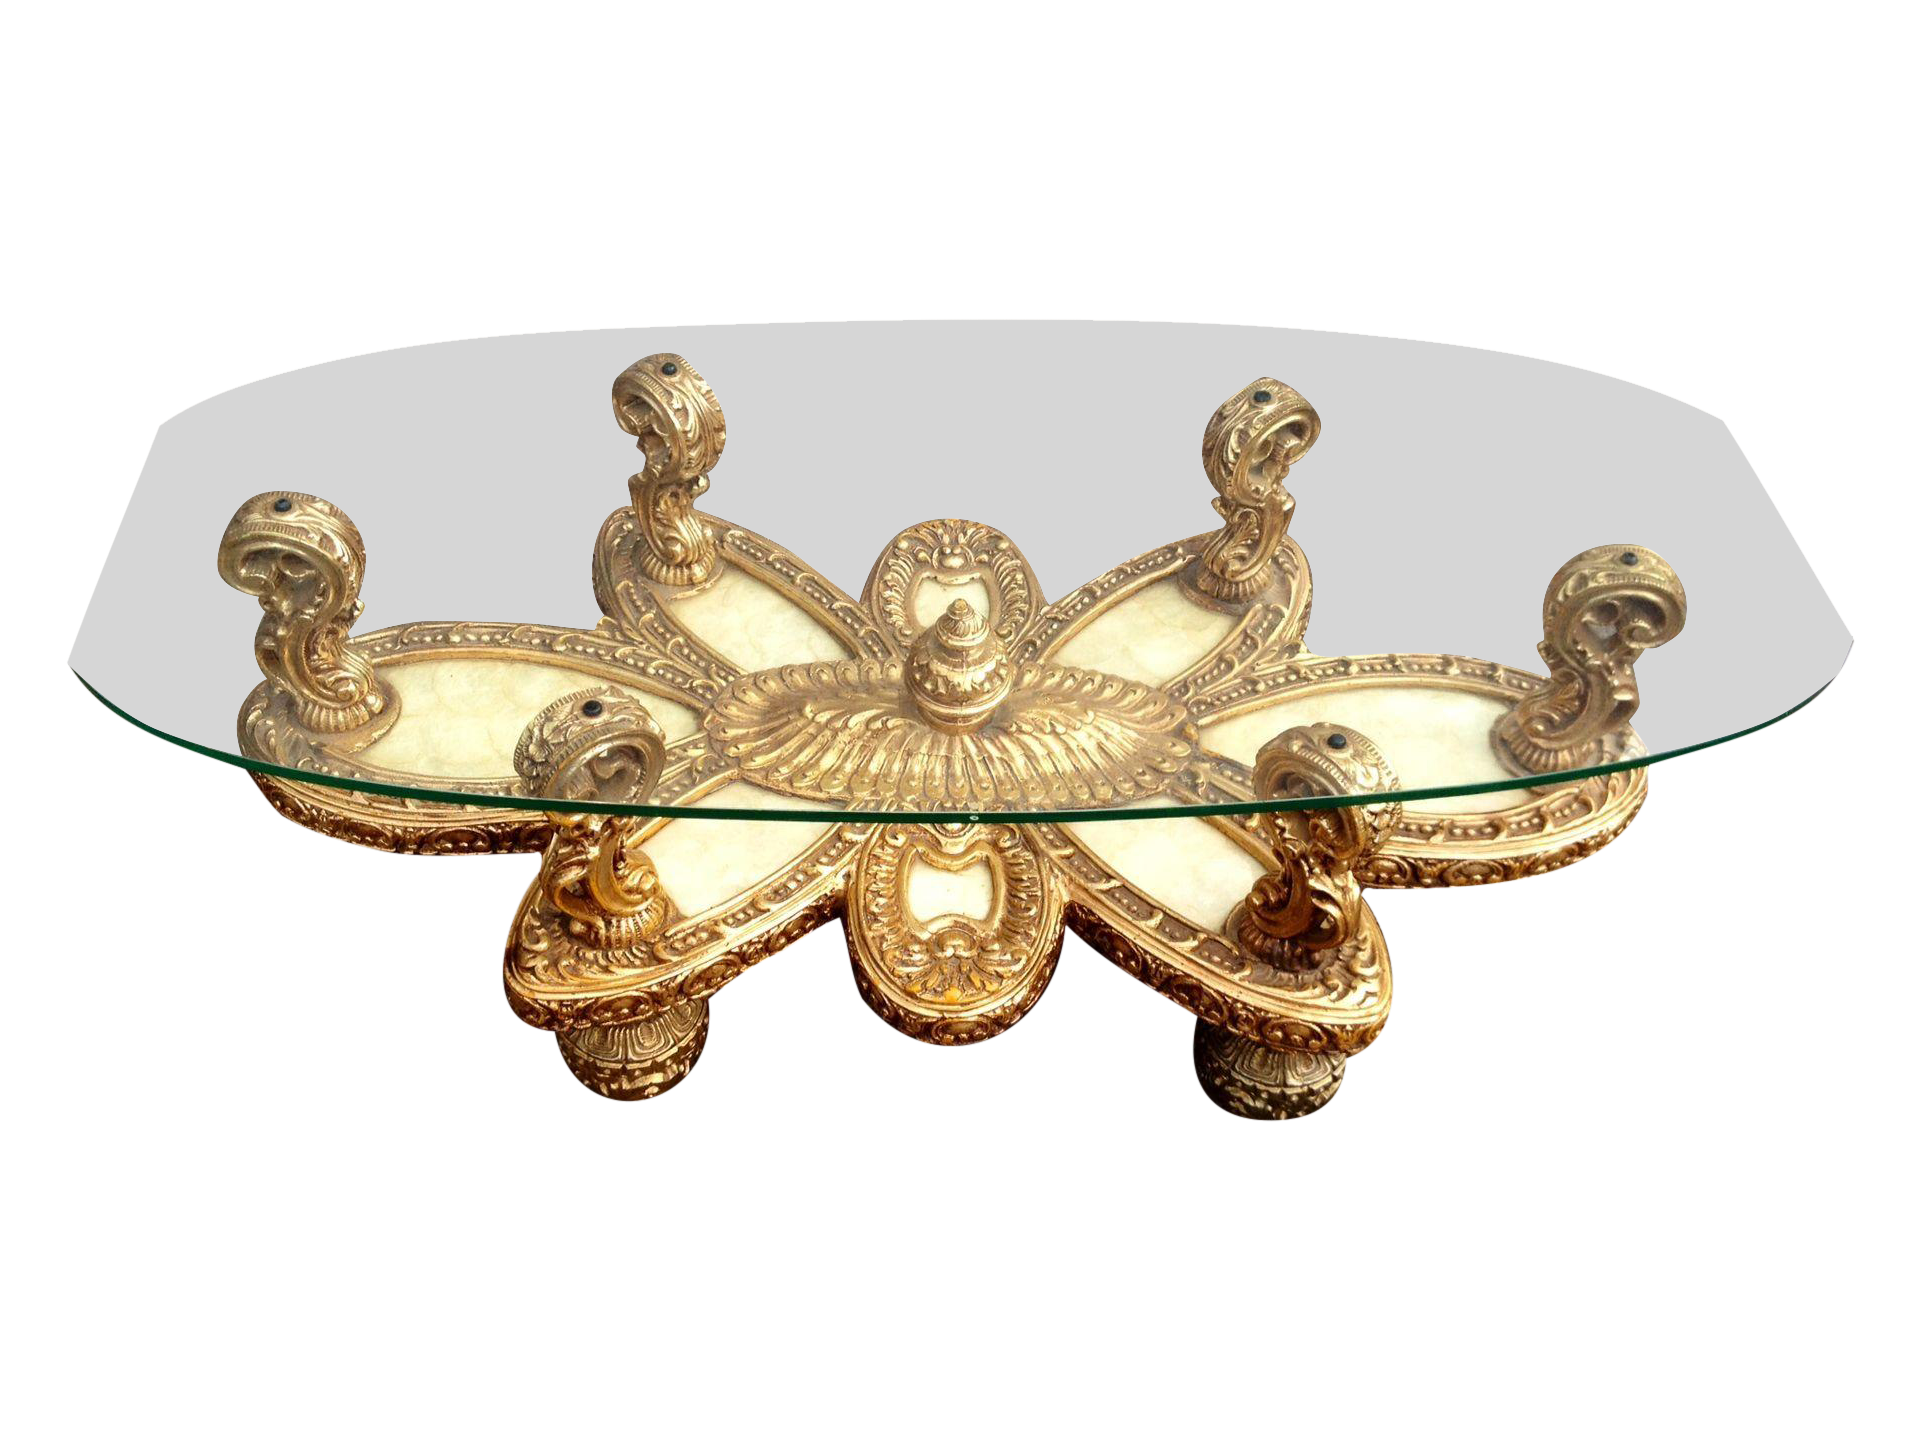 Ornate italian baroque coffee table w shell inlay on chairish ornate italian baroque coffee table w shell inlay on chairish geotapseo Image collections